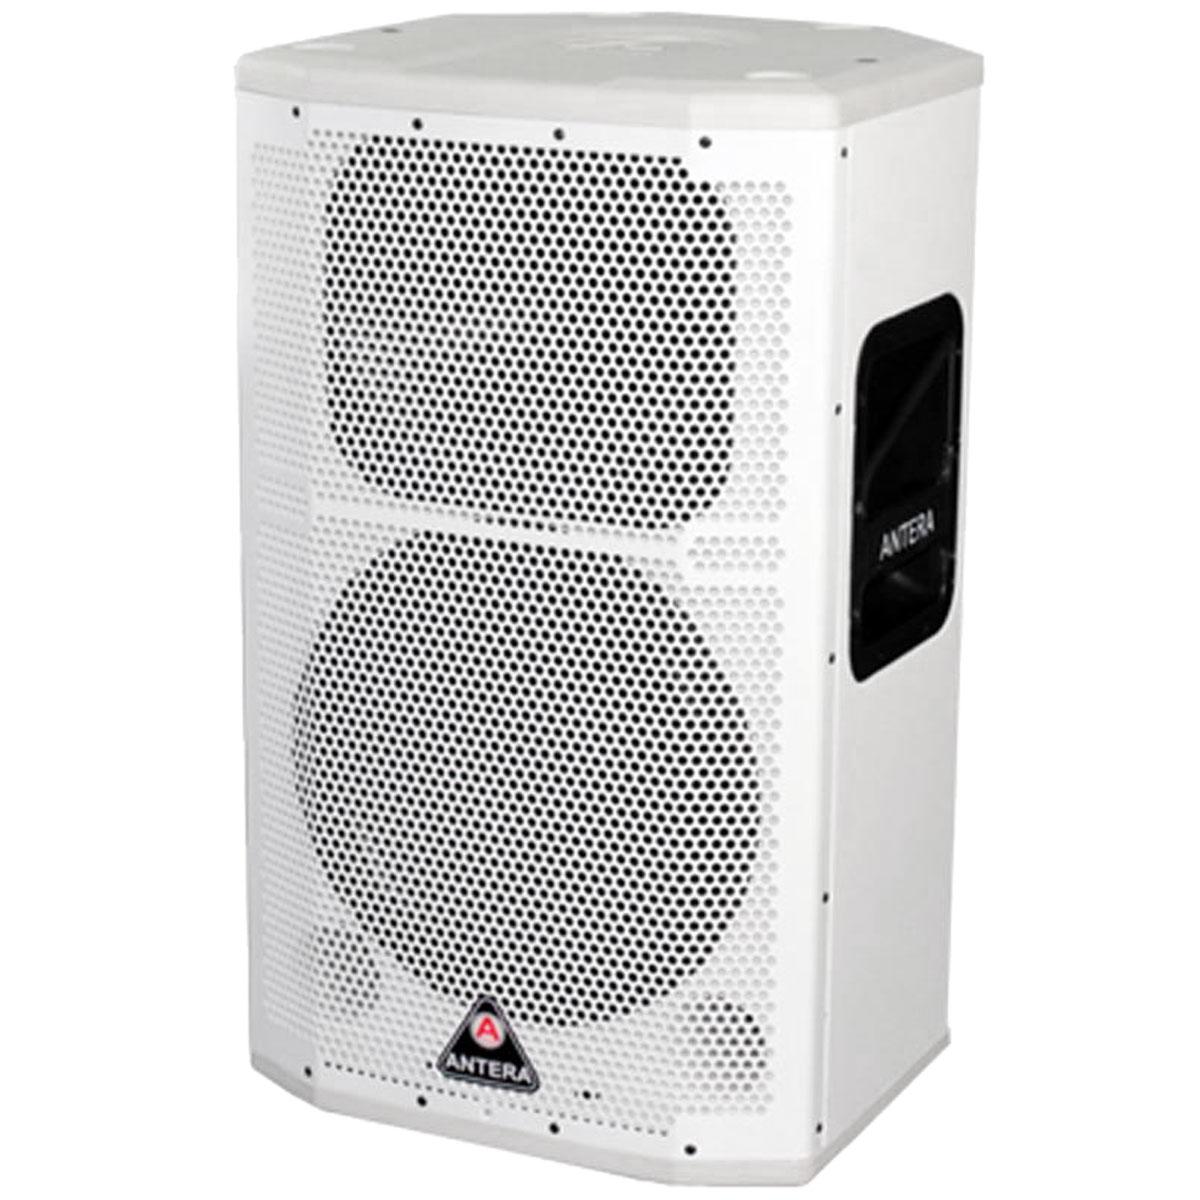 Caixa Ativa 500W Branca HPS12A - Antera